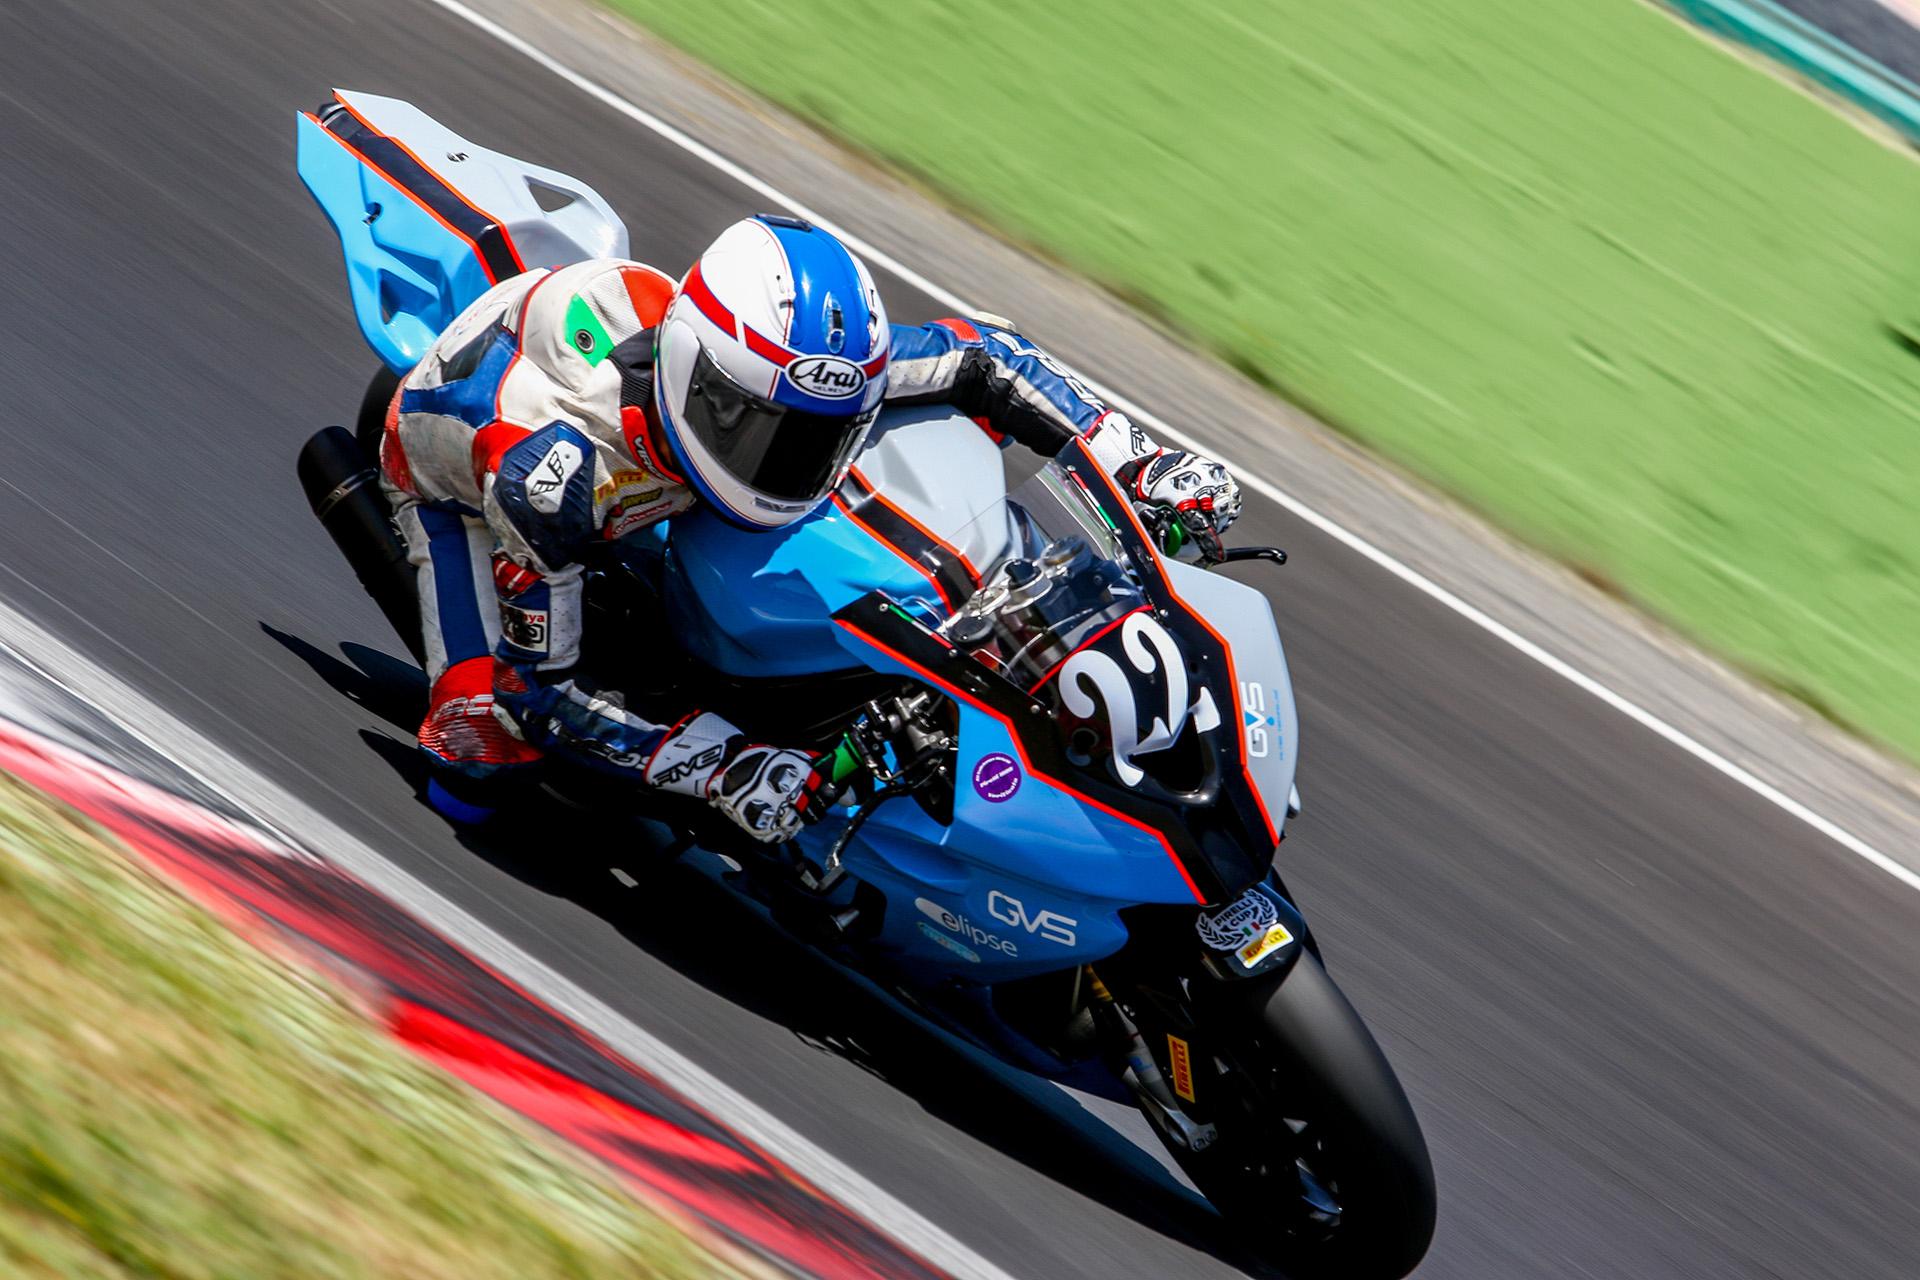 Circuito Vallelunga : Italia naked vascon riparte da vallelunga motorsport fvg